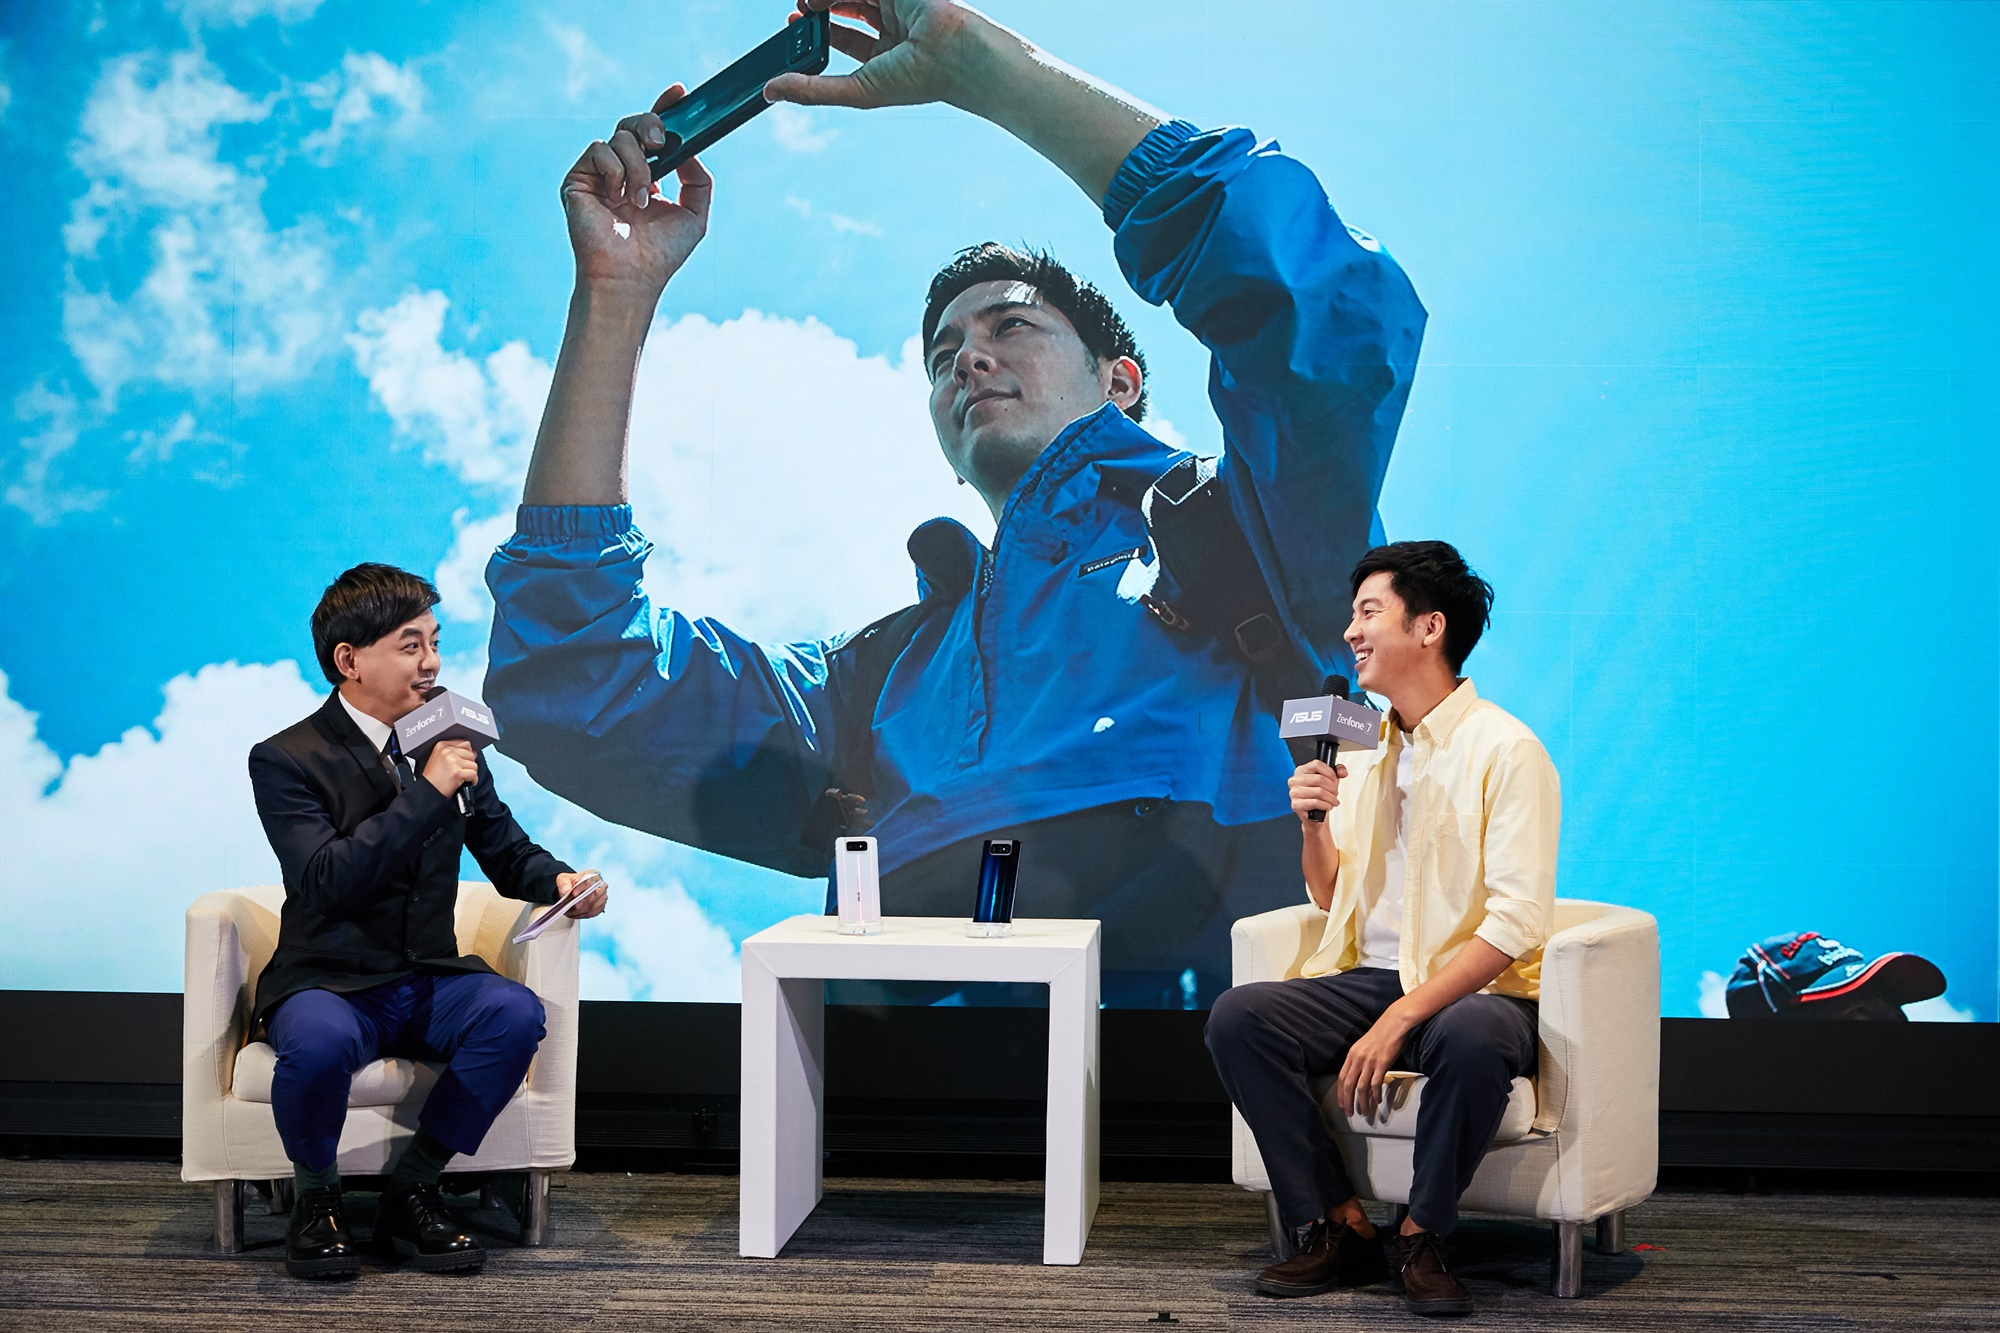 ASUS ZenFone 7使用心得及攝影作品。